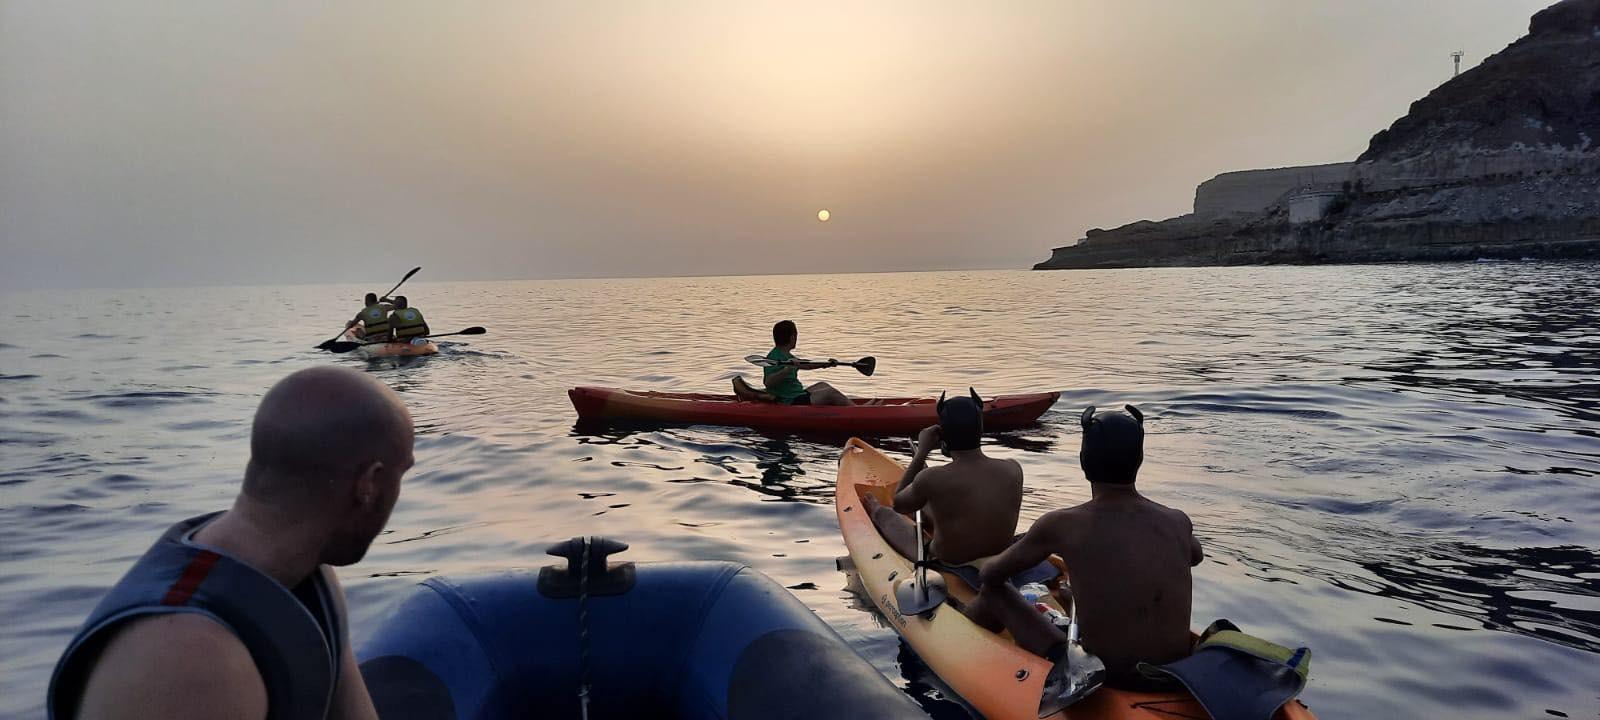 2021-10-06 - Maspalomas Sunset Kayaking - Puppy, Handler & Friends